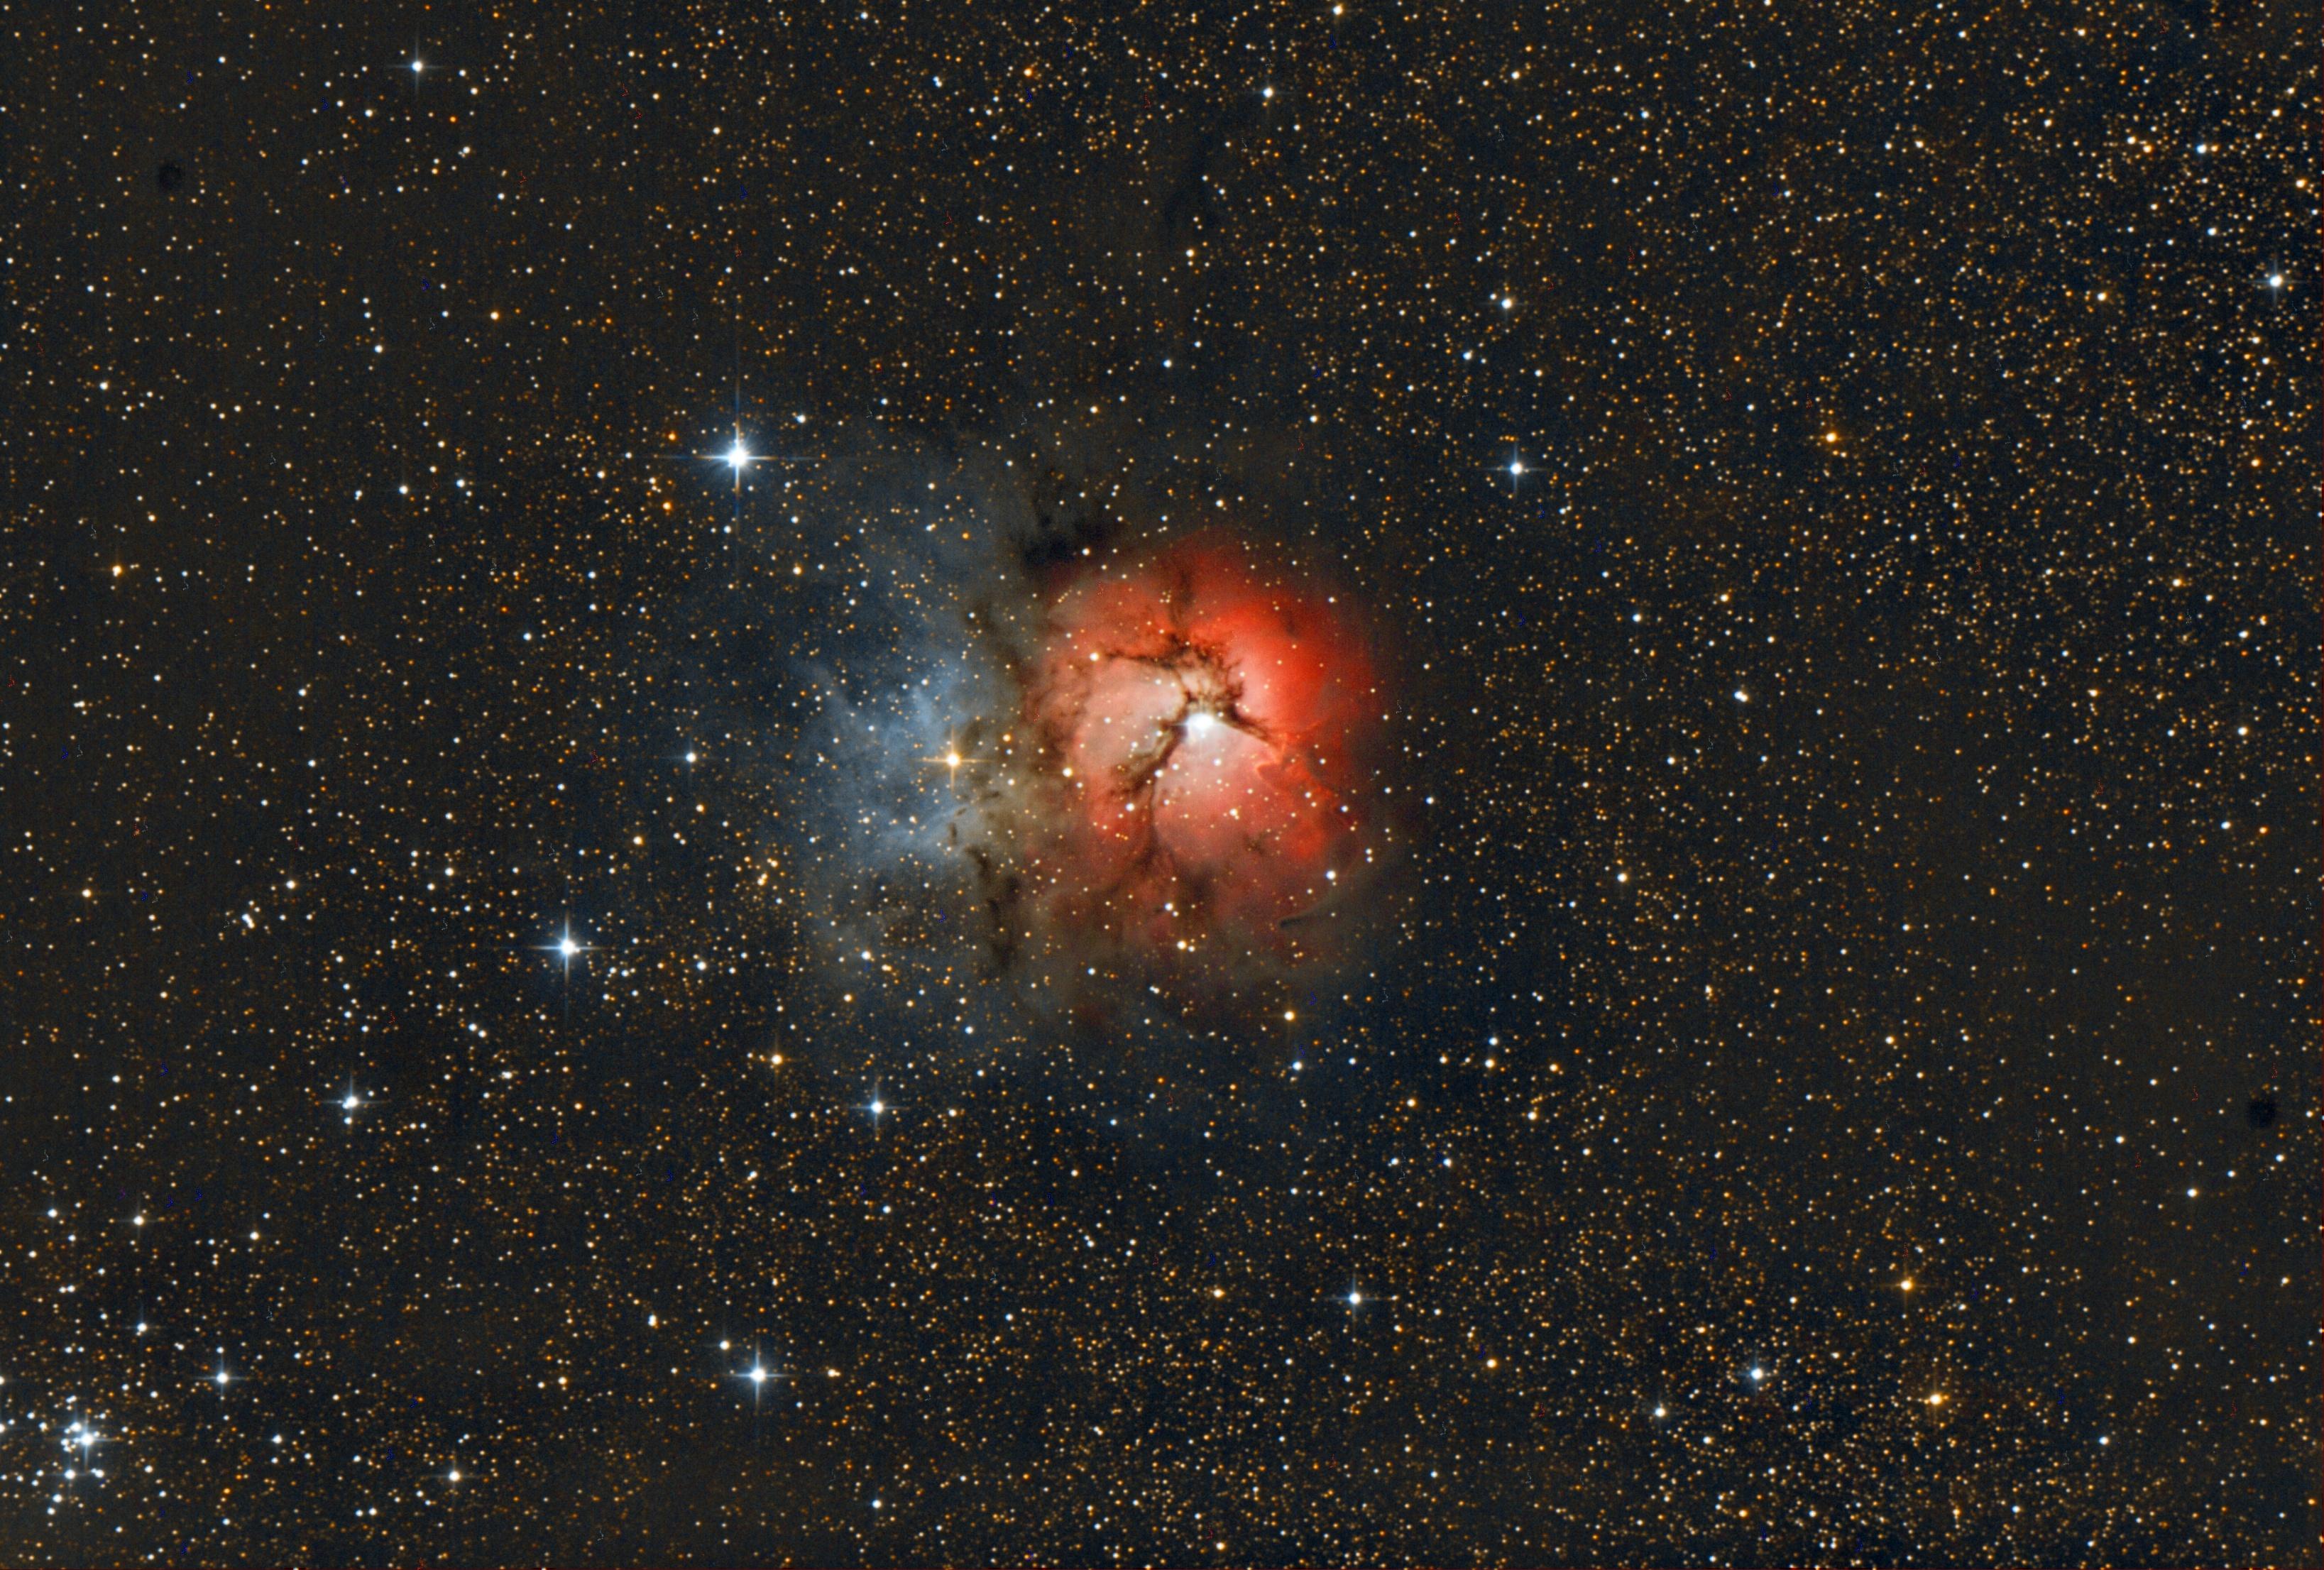 M20 The Trifid Nebula. June 2013. Shawn Nielsen